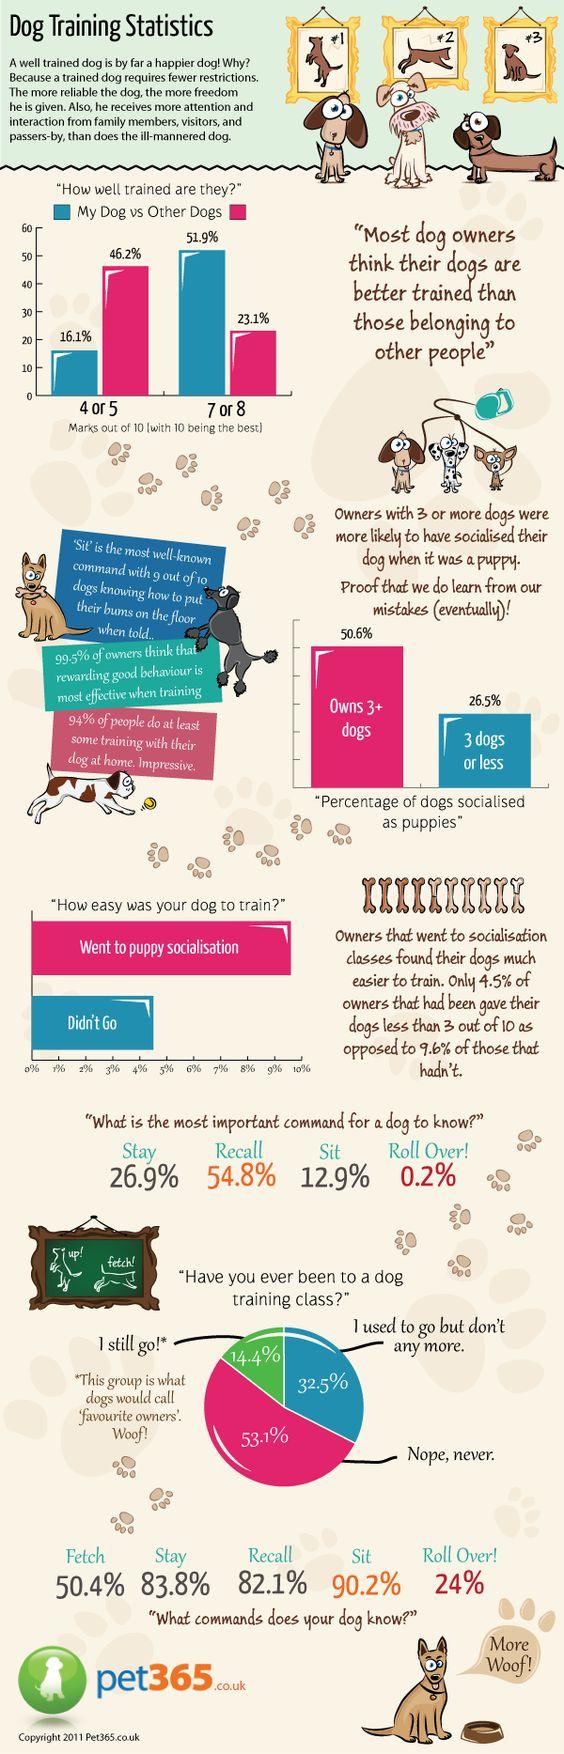 Dog Training Information